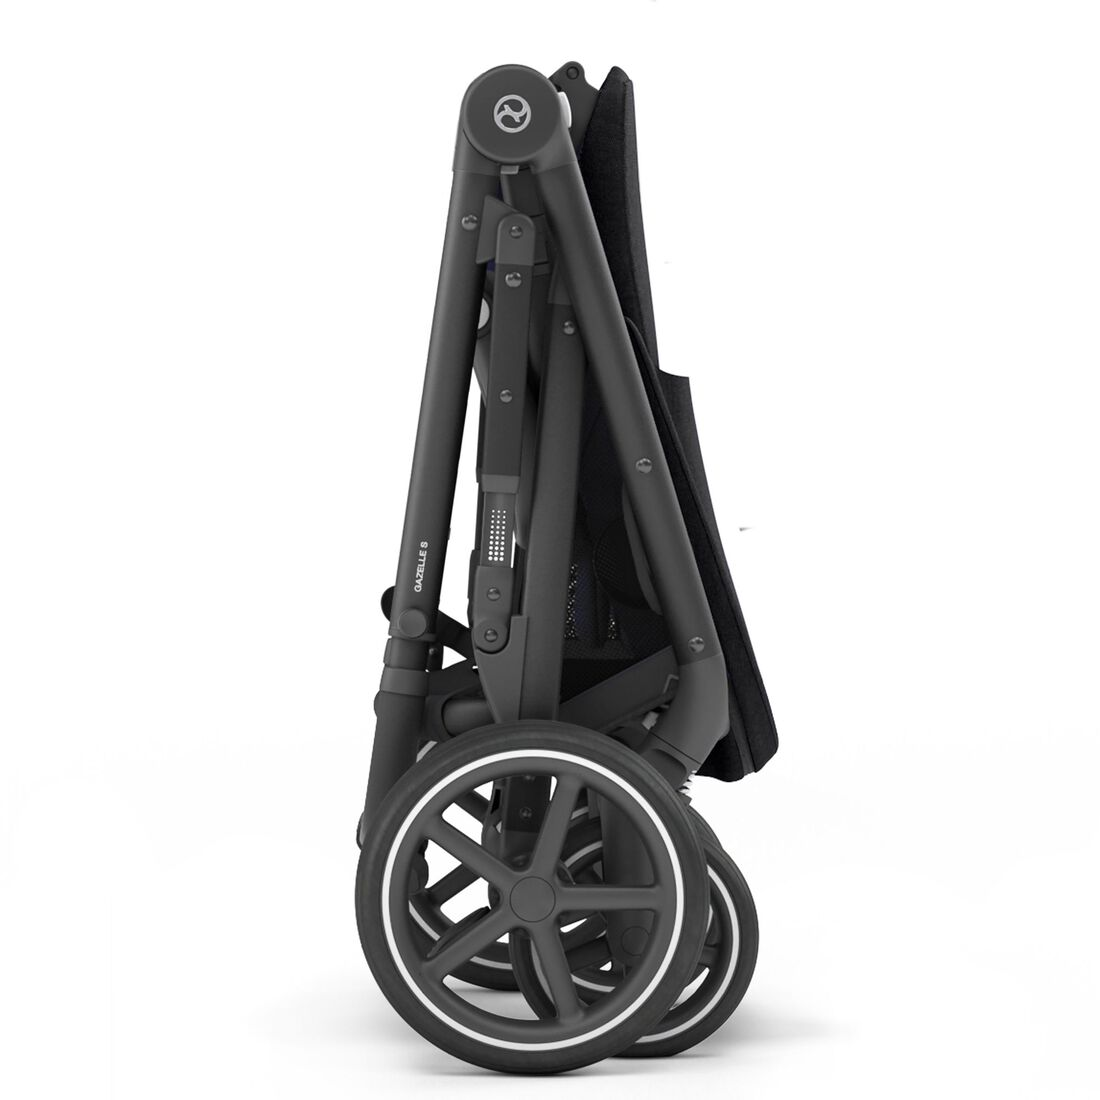 CYBEX Gazelle S - Deep Black (Schwarzer Rahmen) in Deep Black (Black Frame) large Bild 8